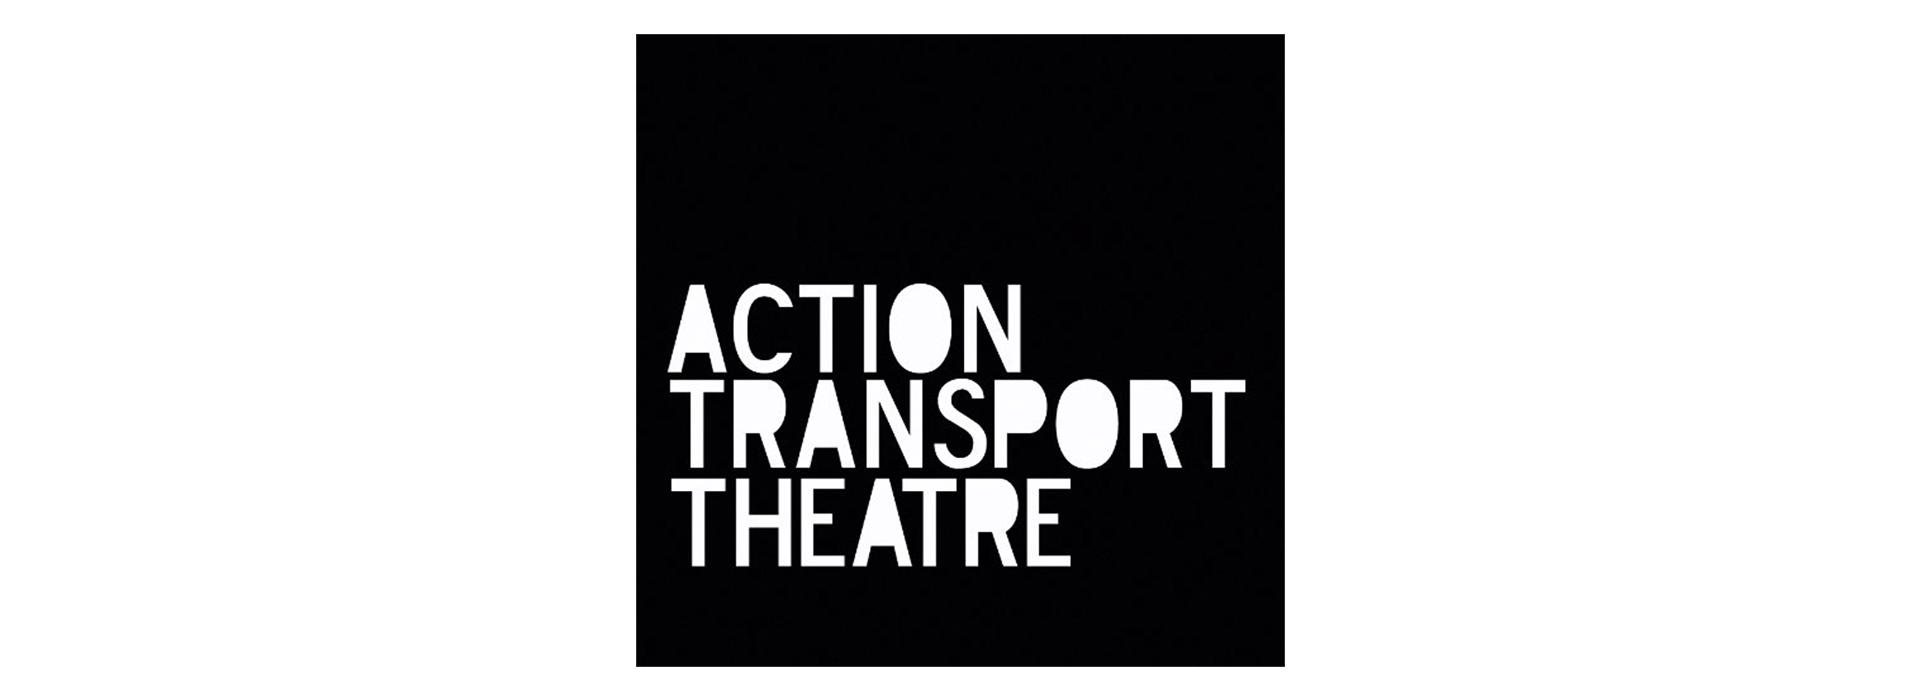 Action Transport Theatre